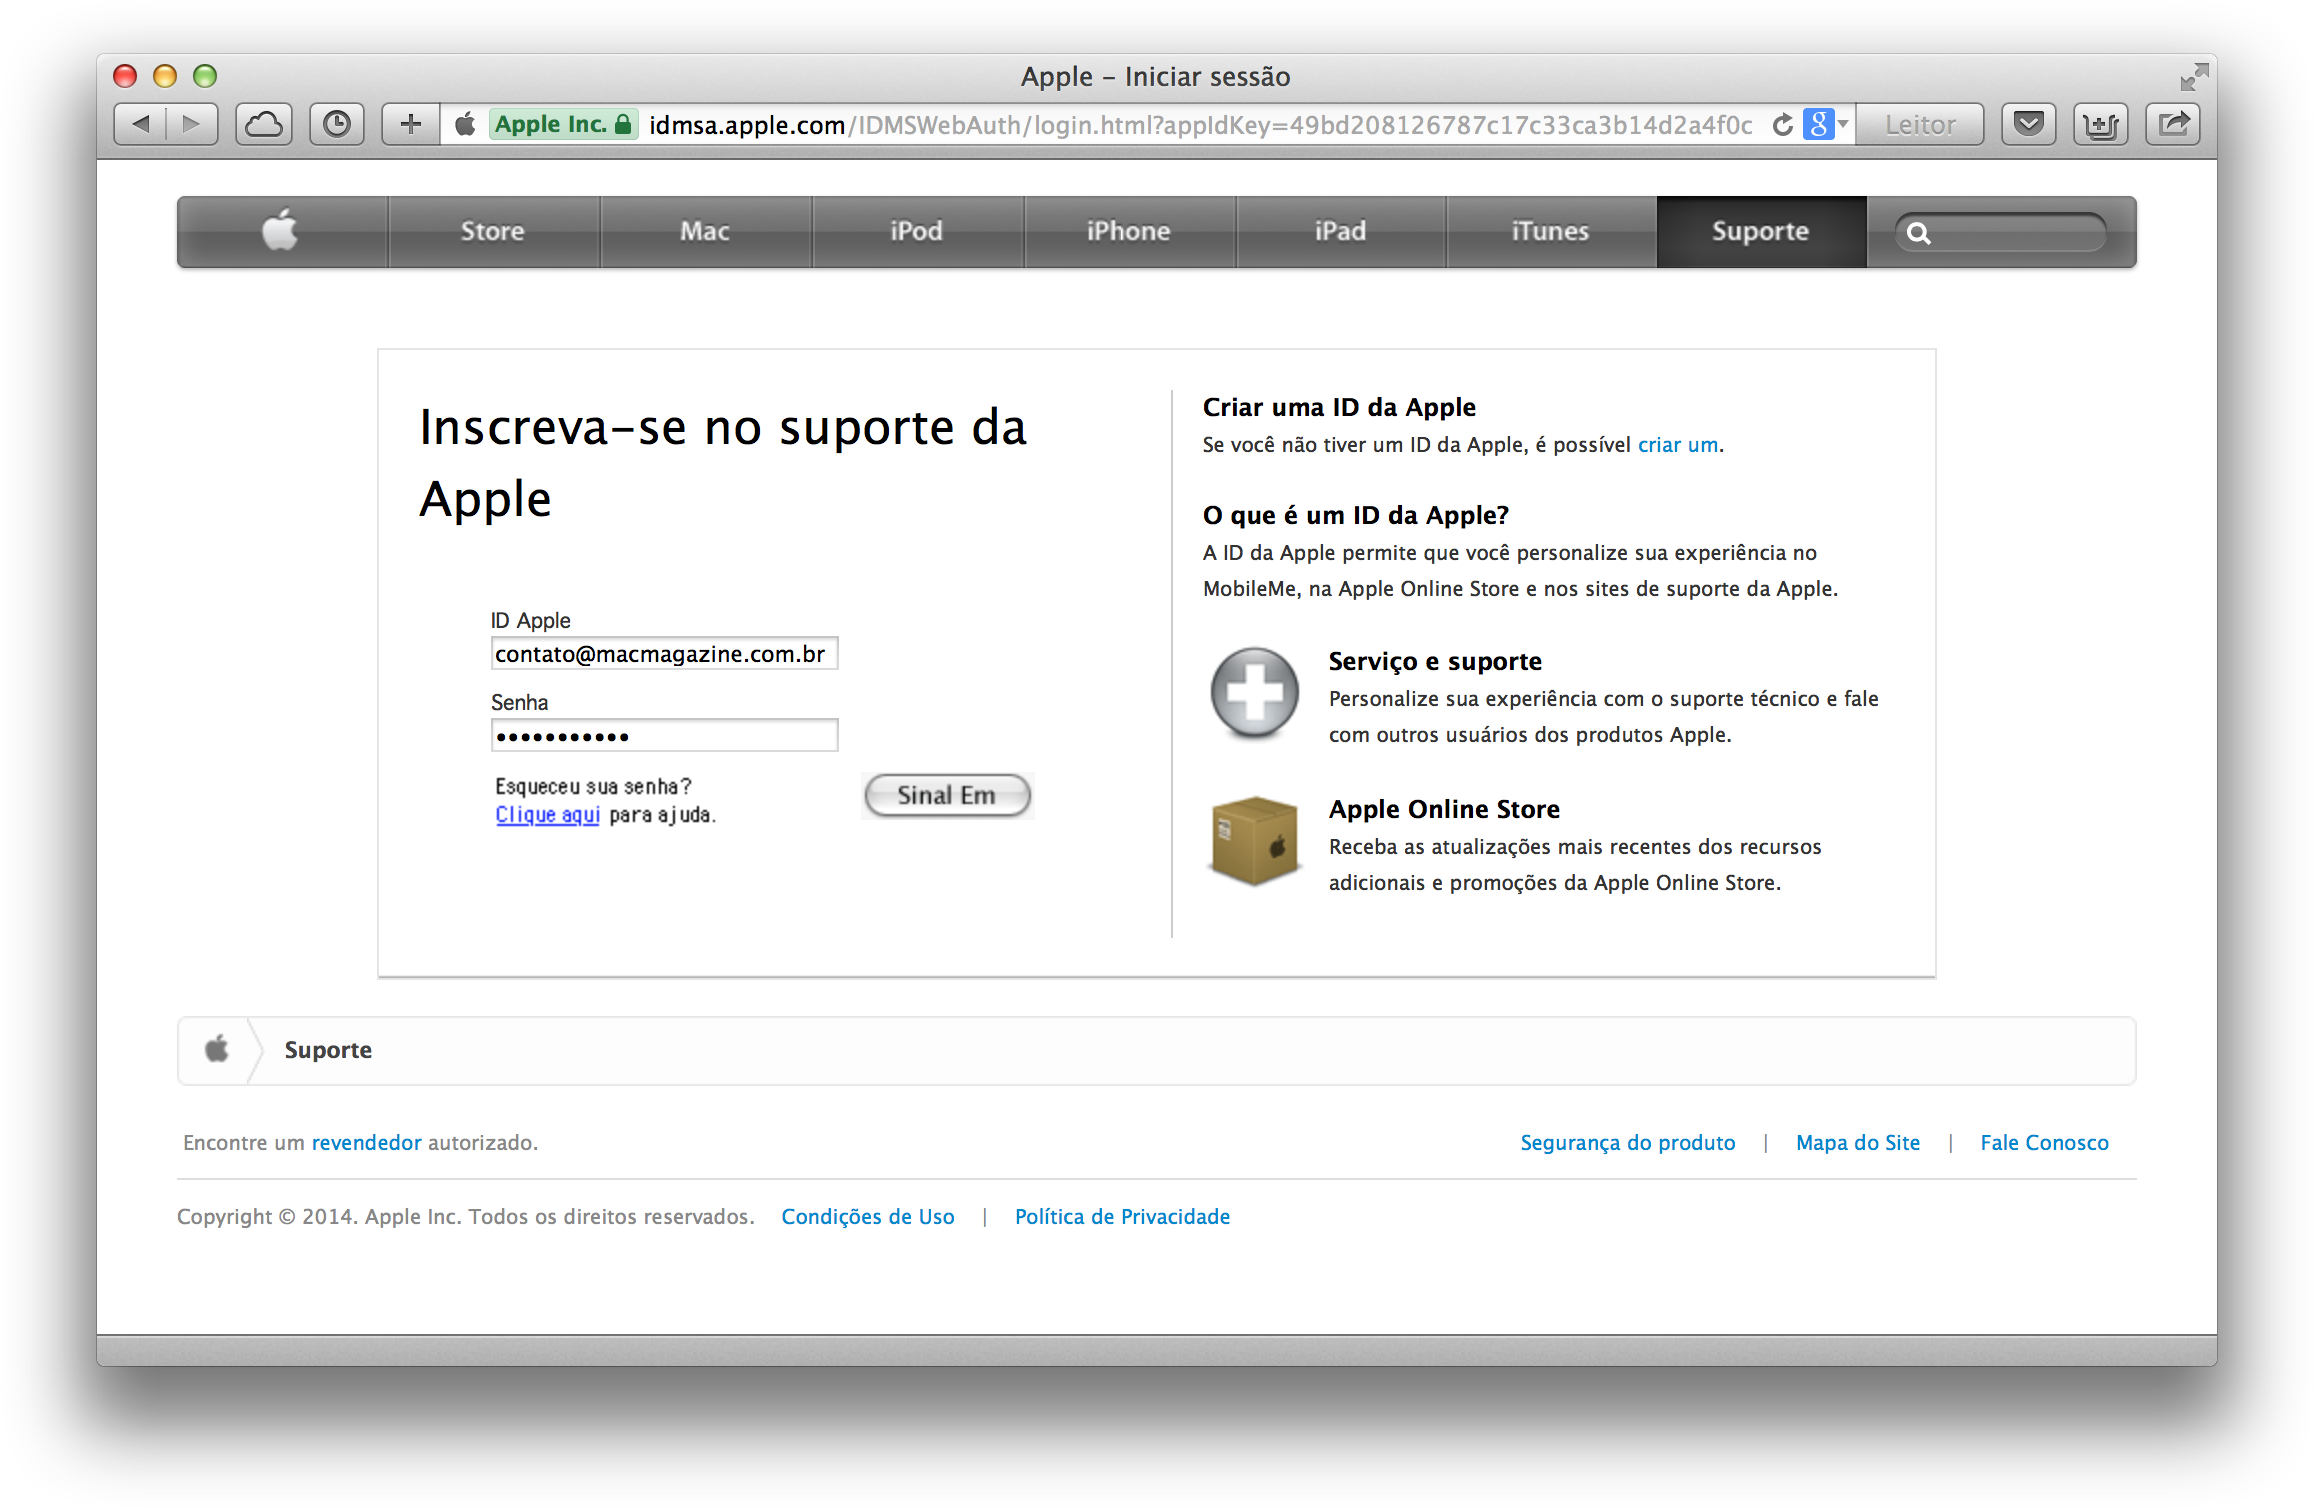 Apple - Sinal Em